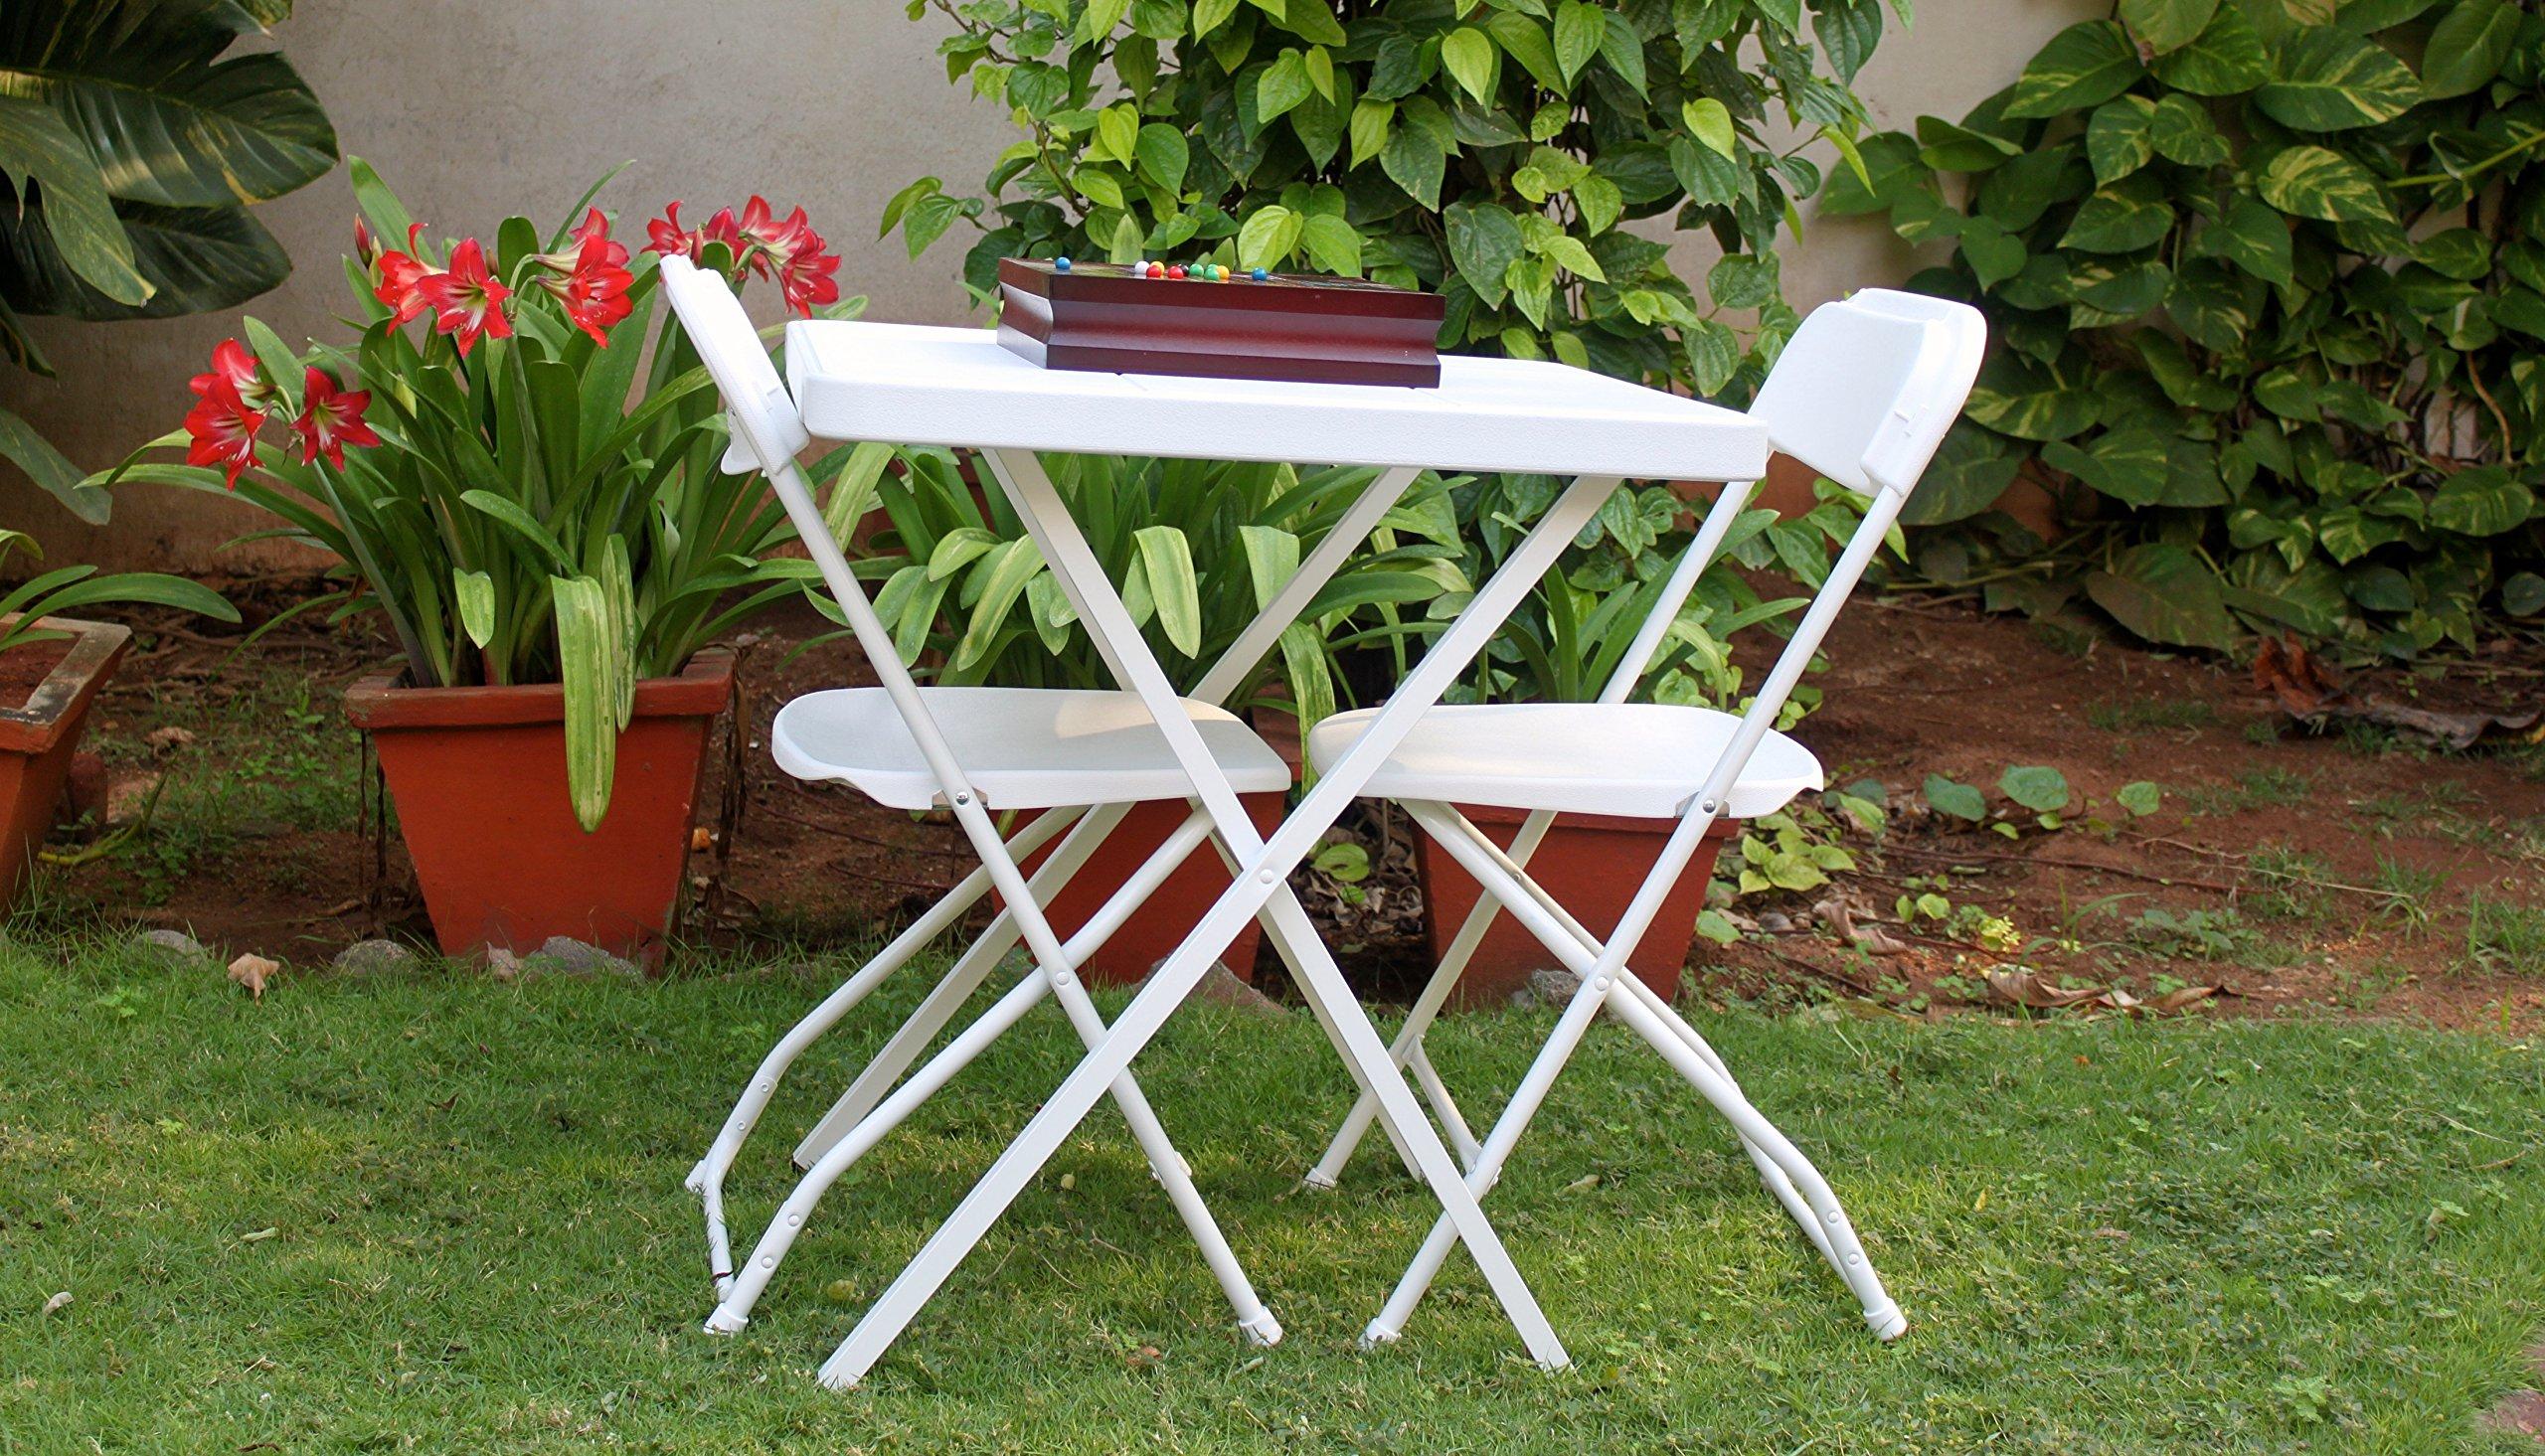 ThinkPro Balcony/Garden Folding Furniture Set: 9 Table & 9 Chairs - White